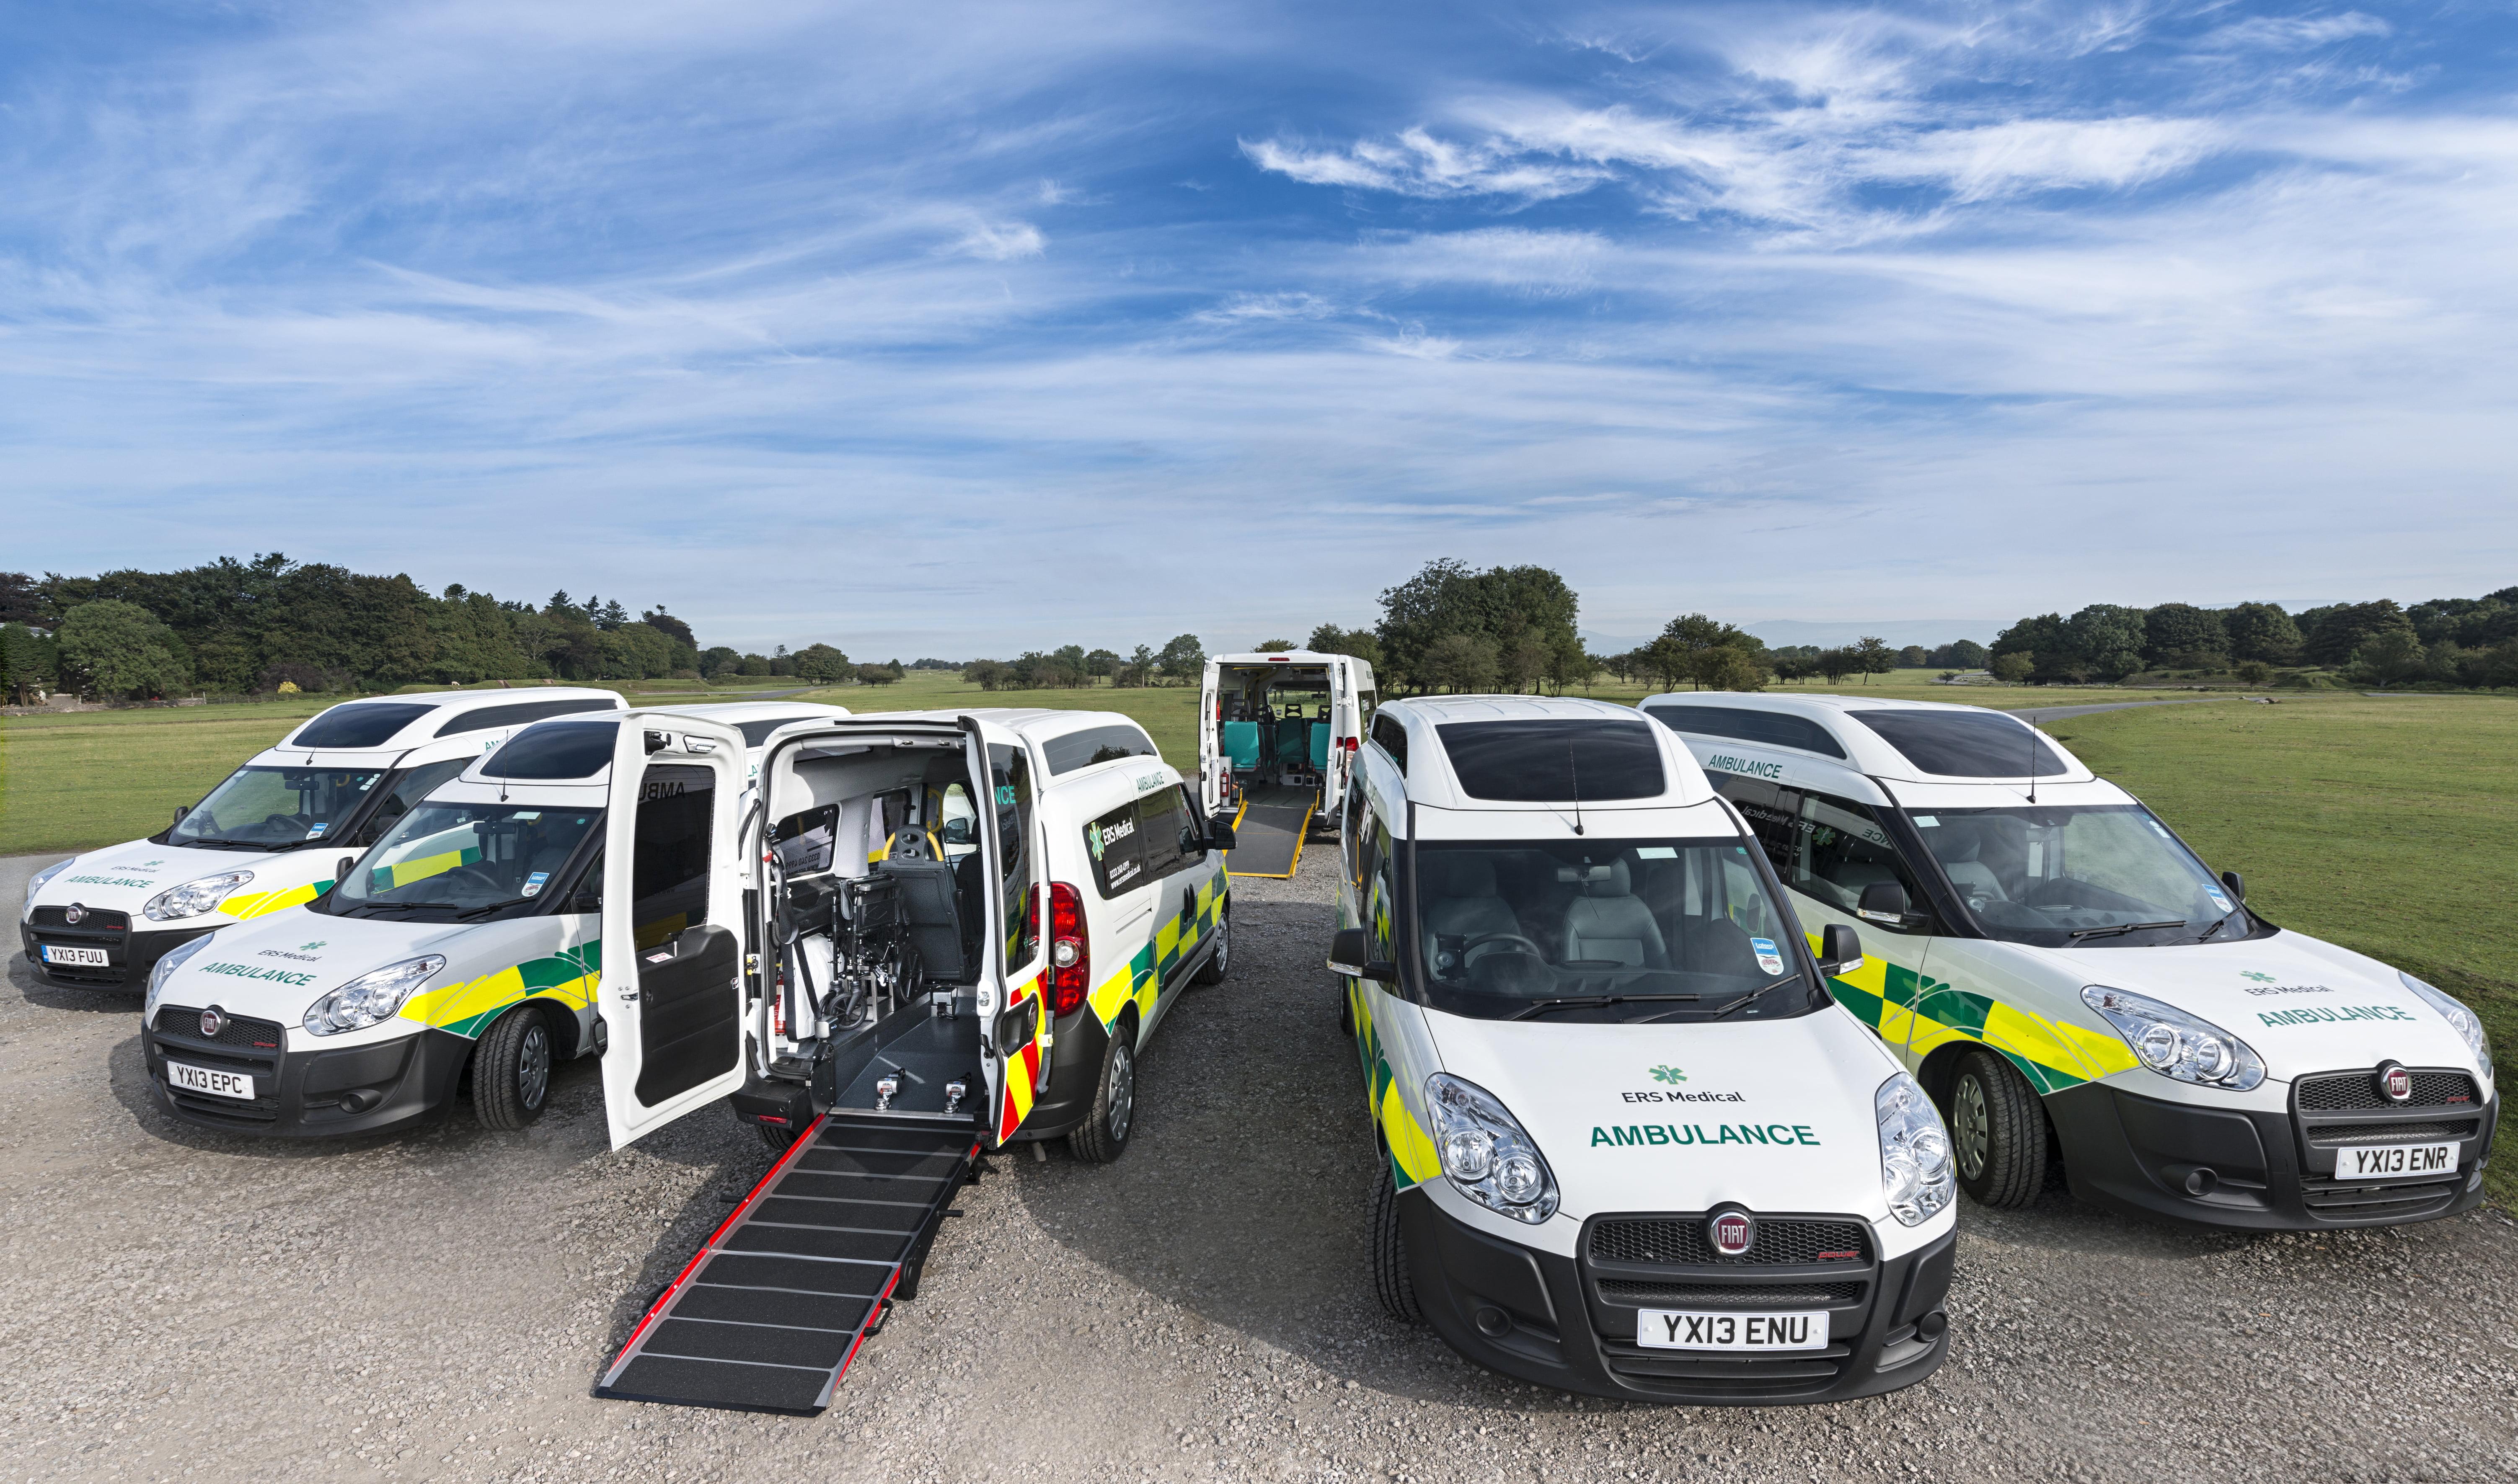 ERS Medical Ambulance Patient Transport